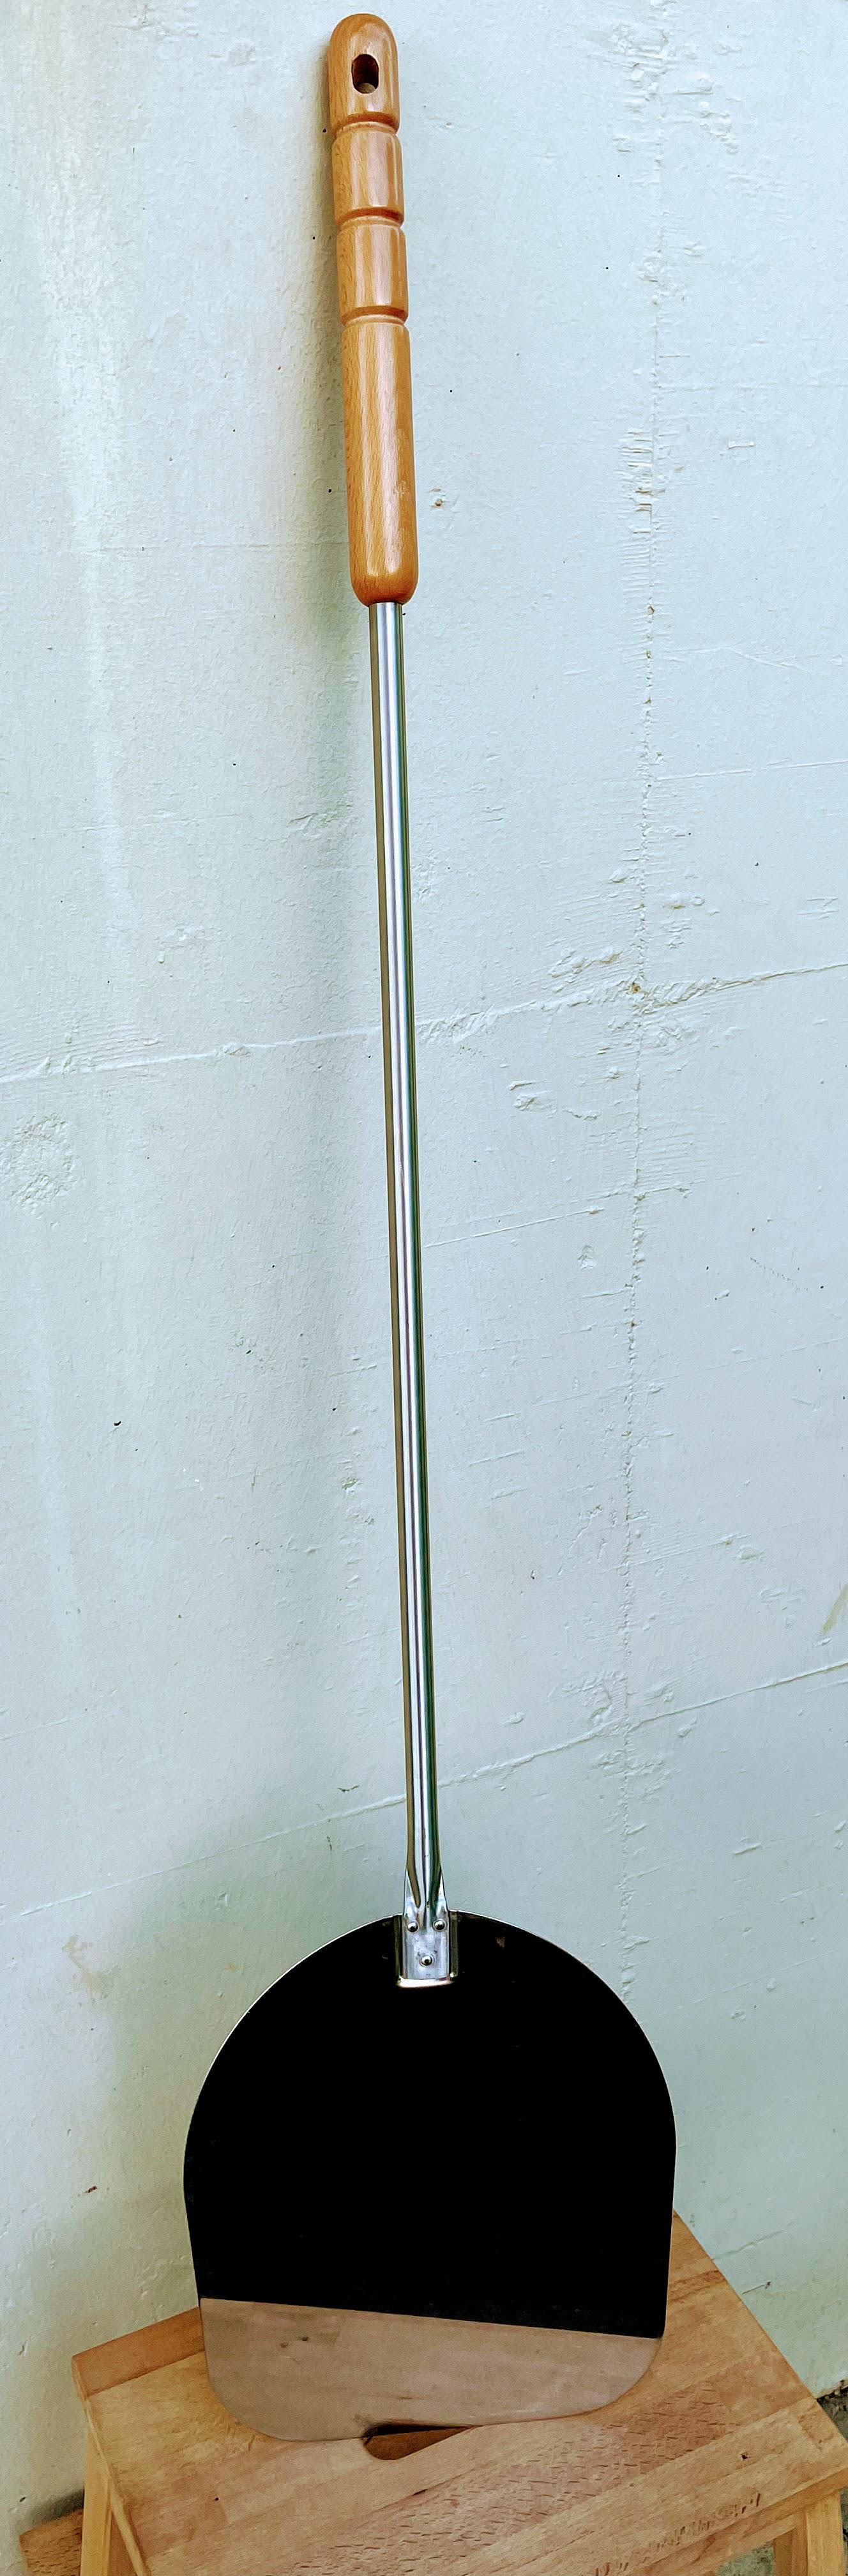 Edelstahlschieber Ø 300 Länge 1500 mm